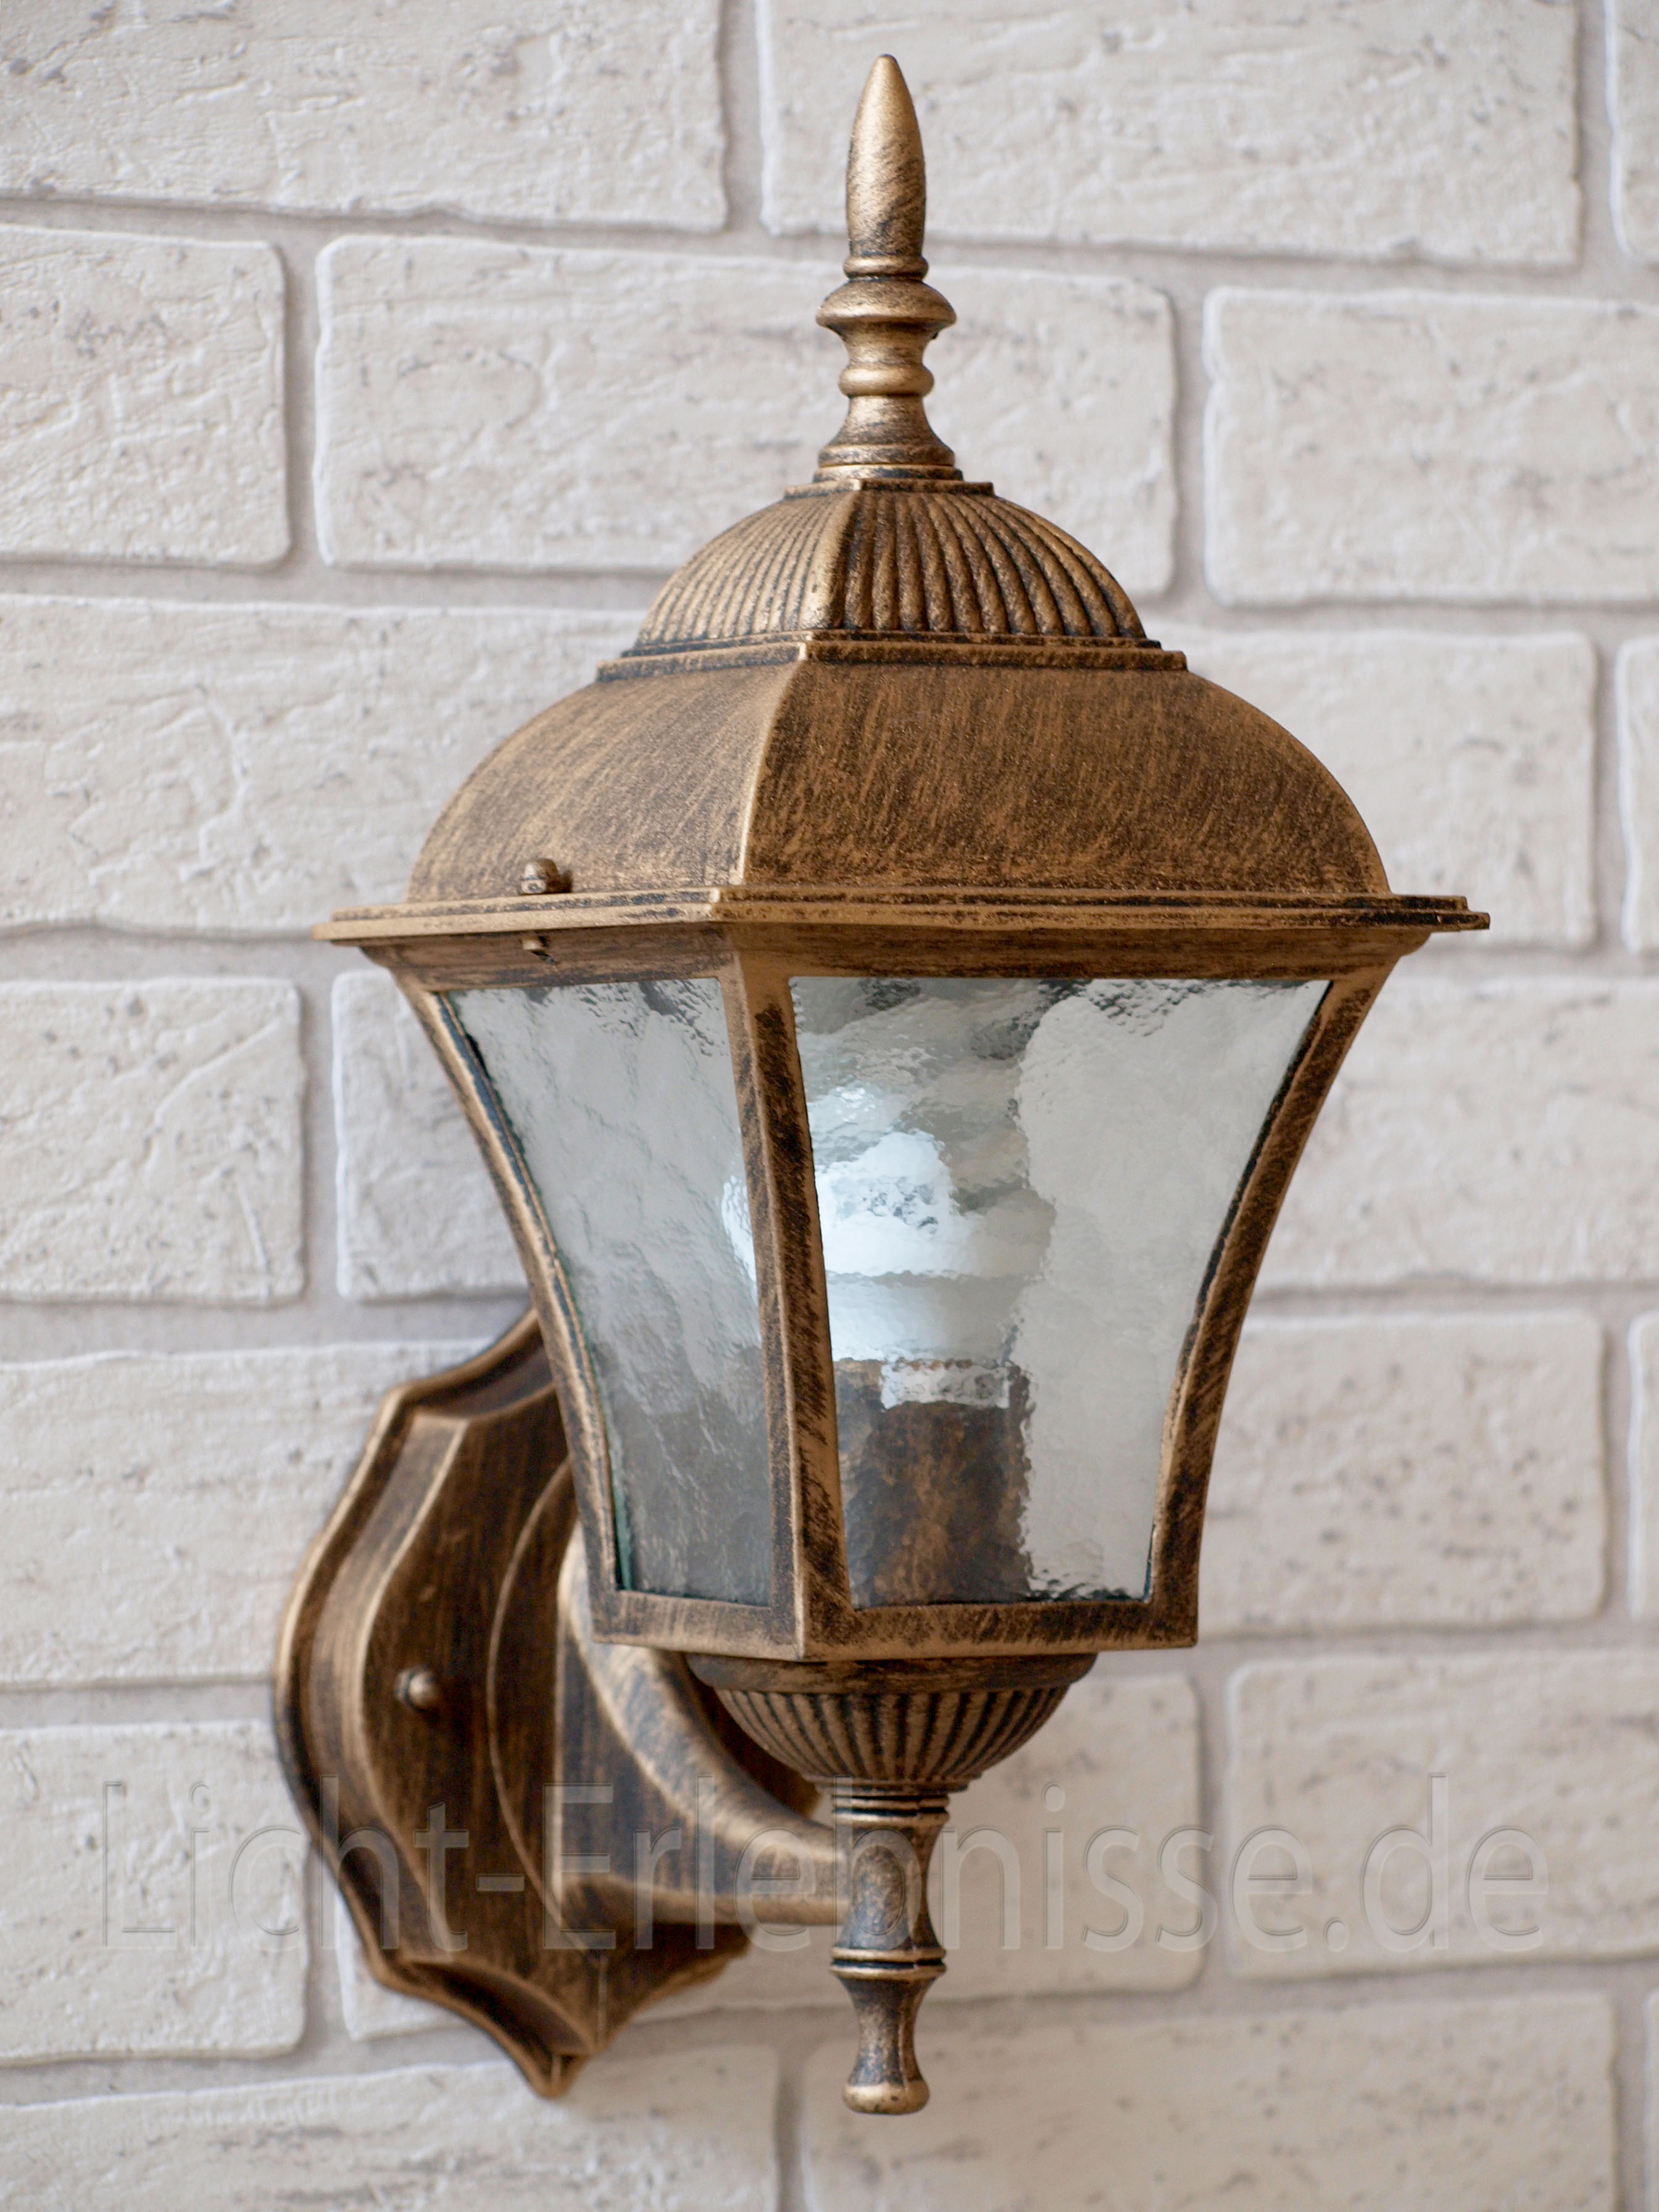 Edle Wandaußenleuchte in antik Außenlampe Hoflampe Laterne Aufputz Wandlampen